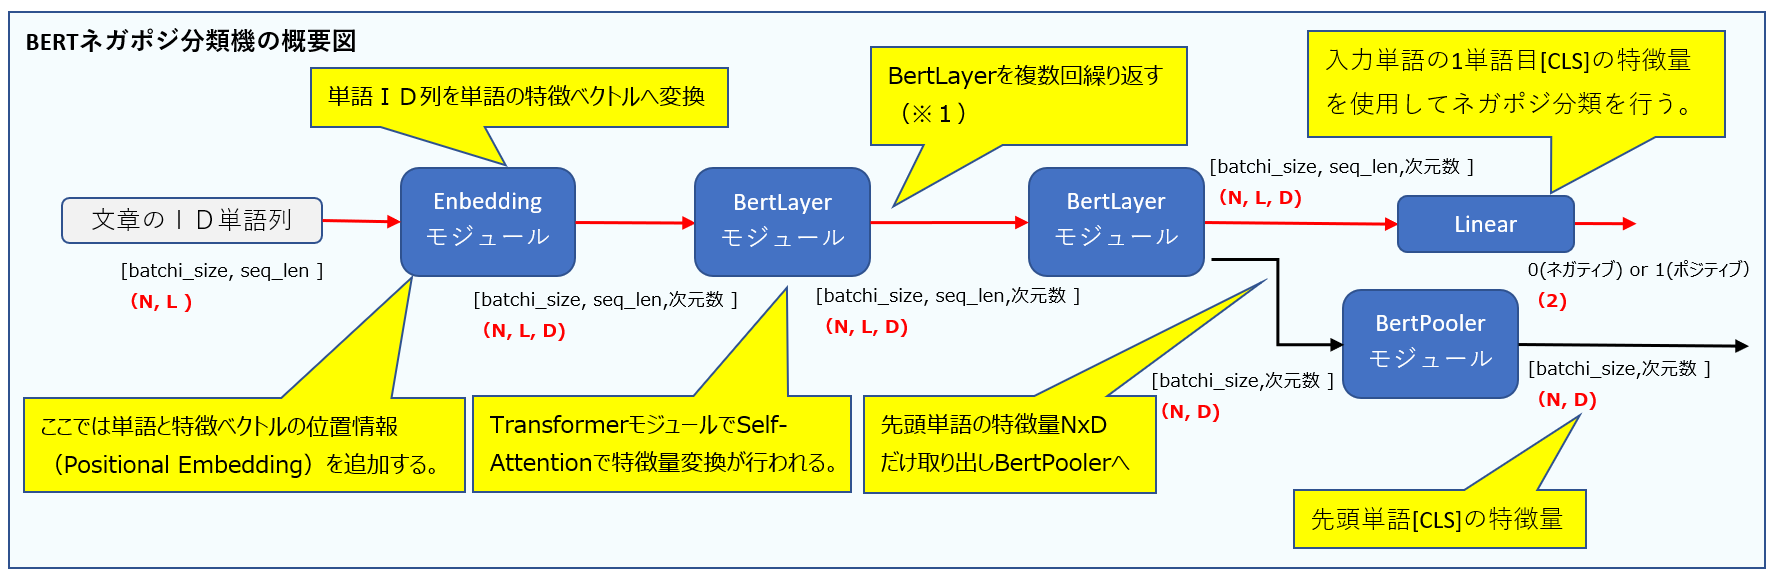 bertネガポジ分類機の概要図.png